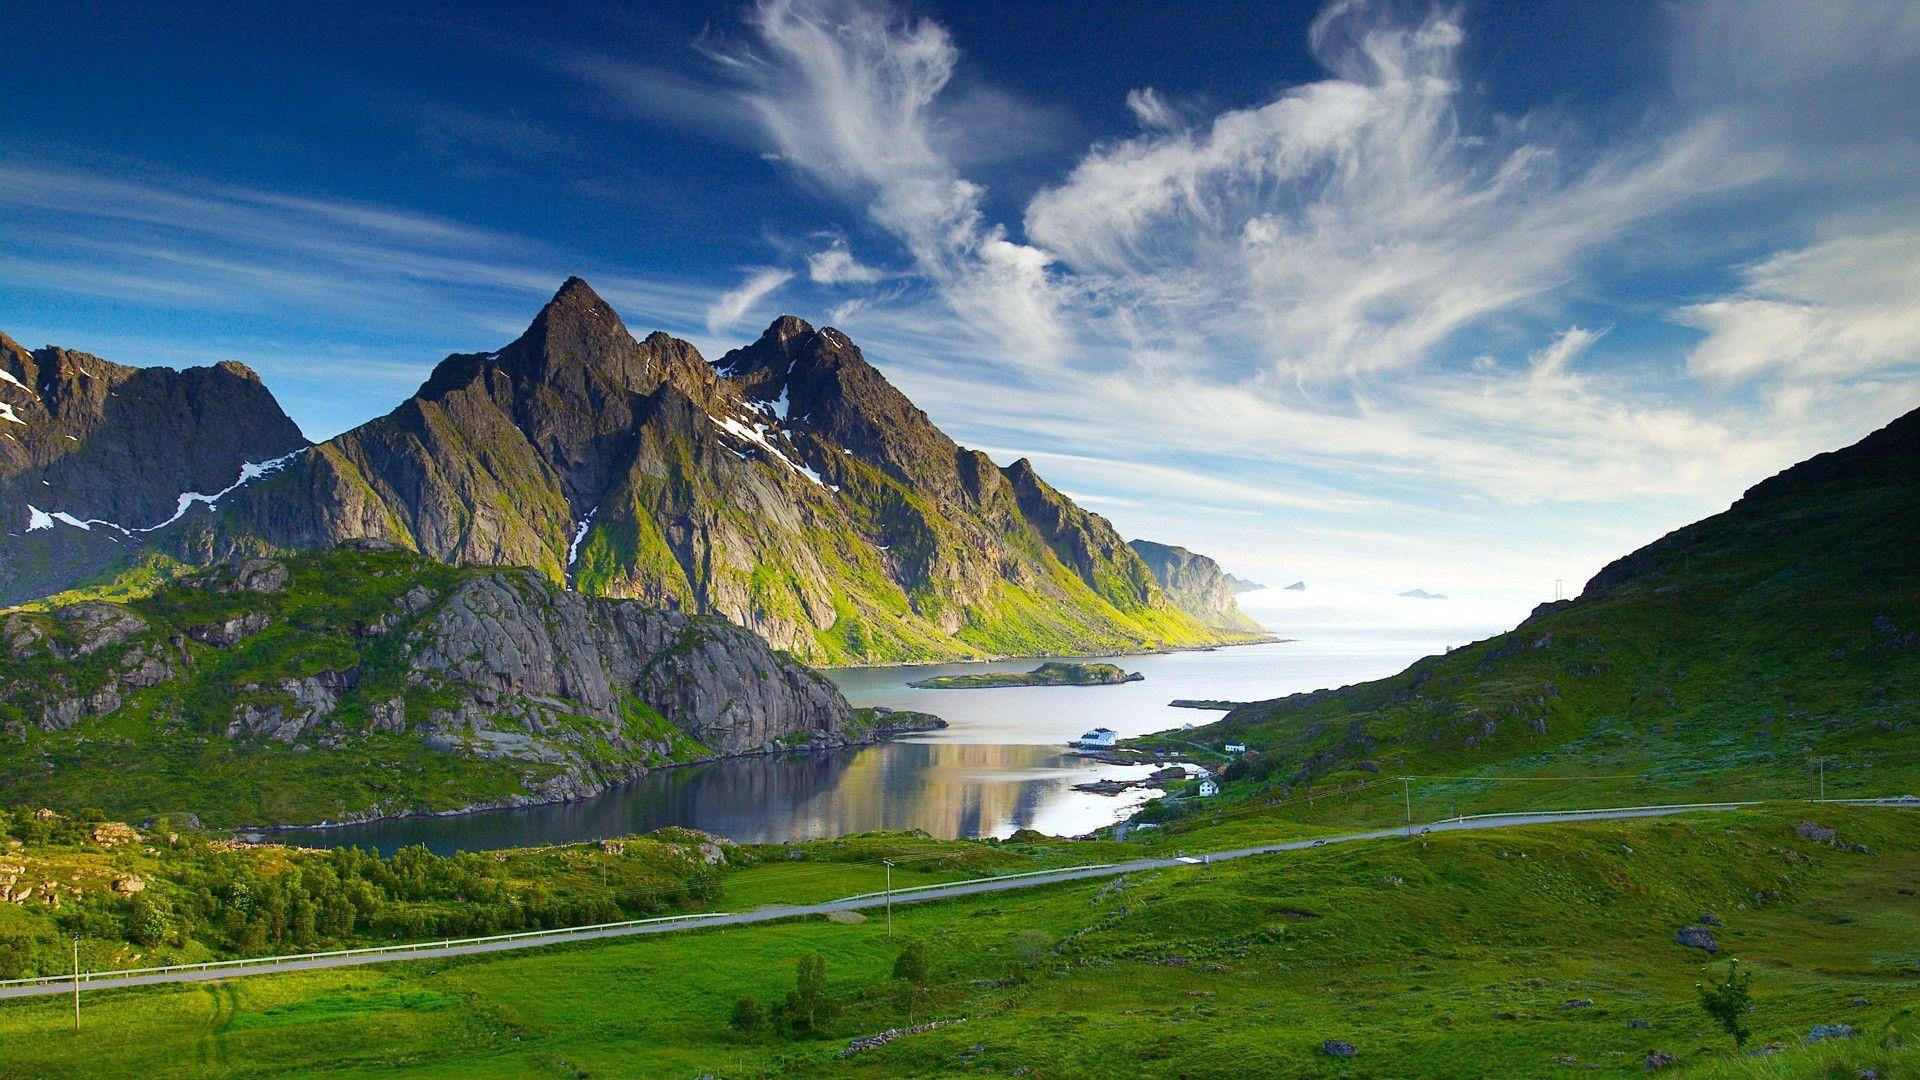 Landscape Wallpaper HD 1080p